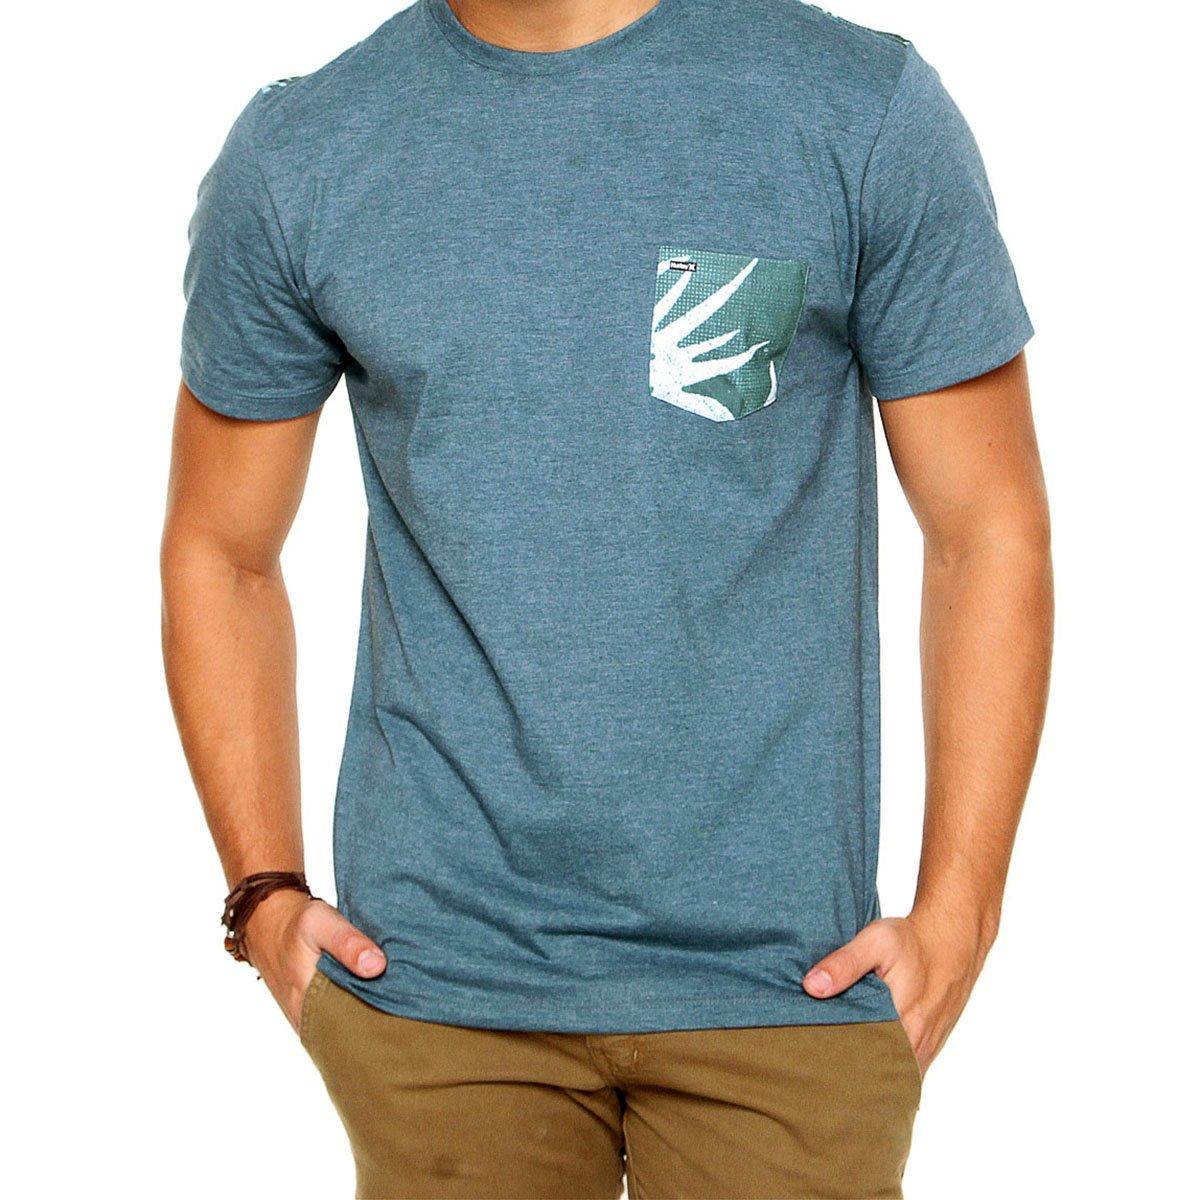 Camiseta Hurley Especial Burst Masculina - Verde